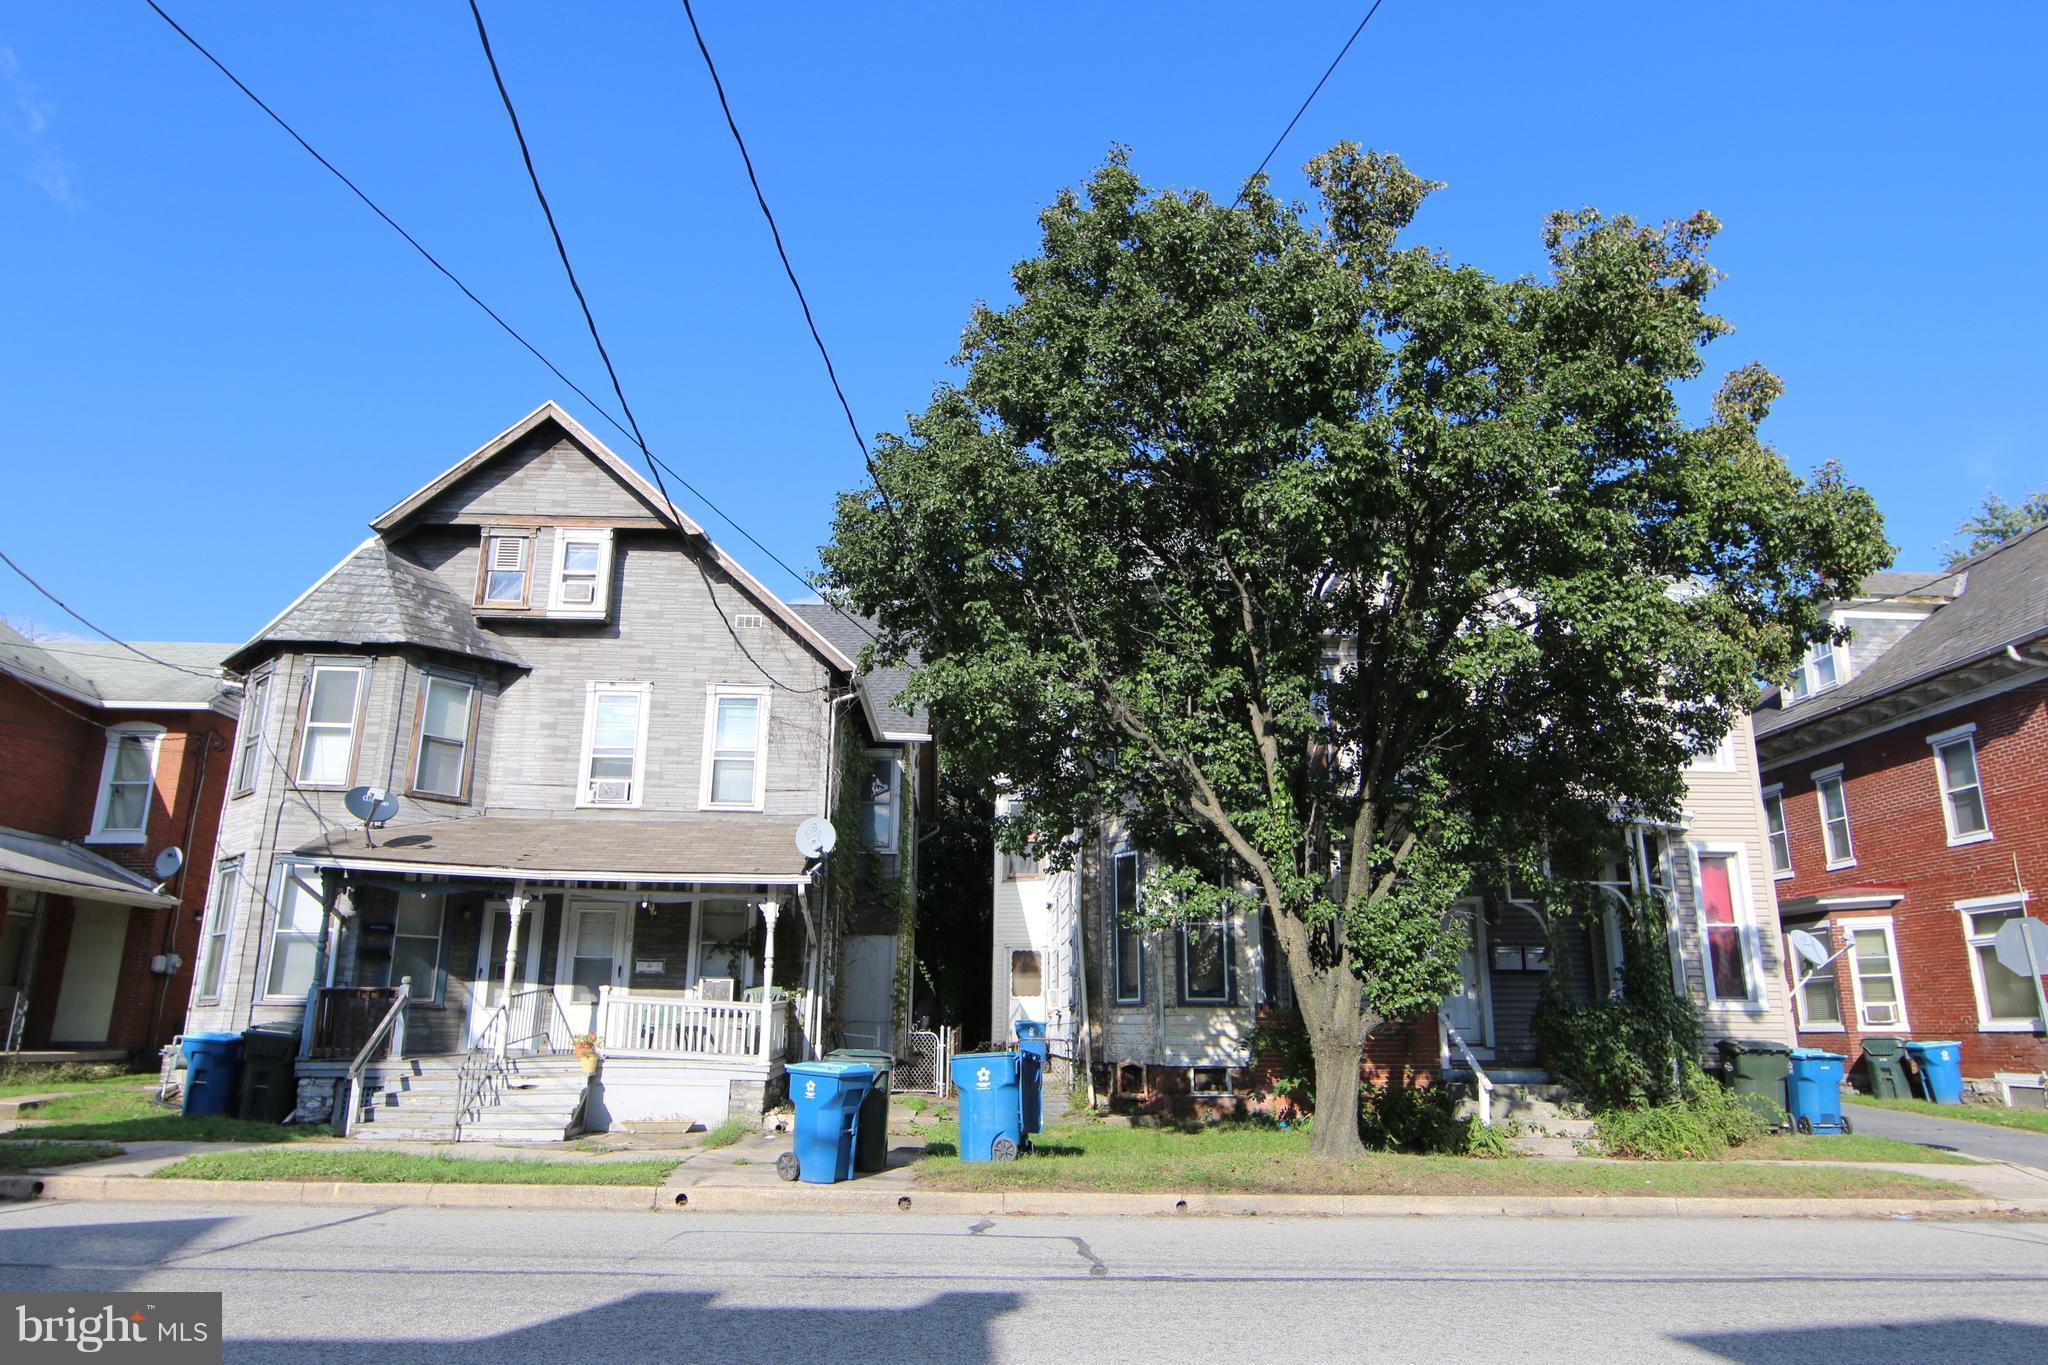 114 2ND STREET, HIGHSPIRE, PA 17034